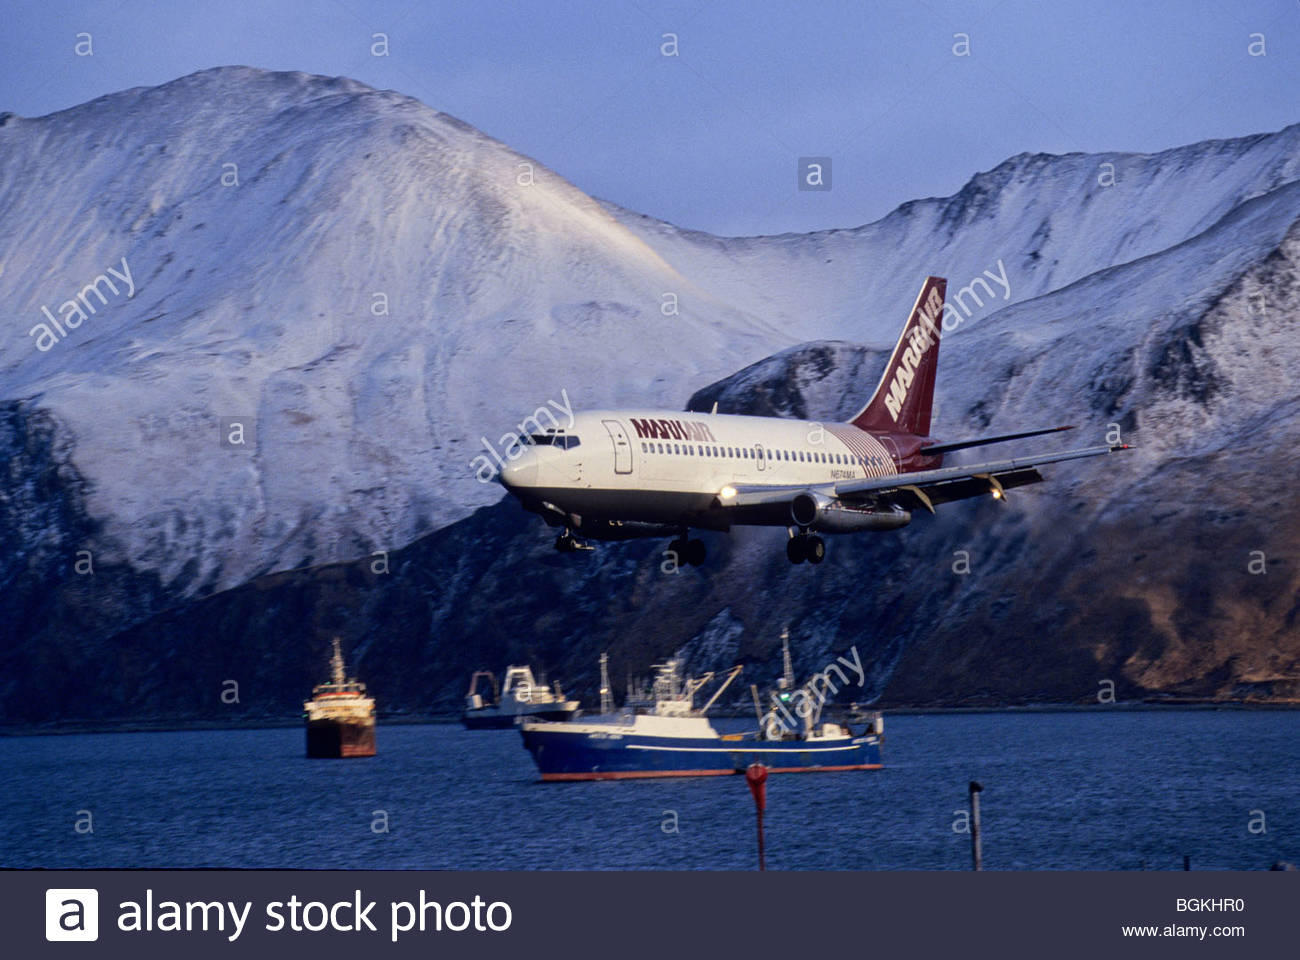 Grand aleutian dutch harbor alaska - Alaska Dutch Harbor Markair Jet Lands At Airport Fishing Trawlers Behind